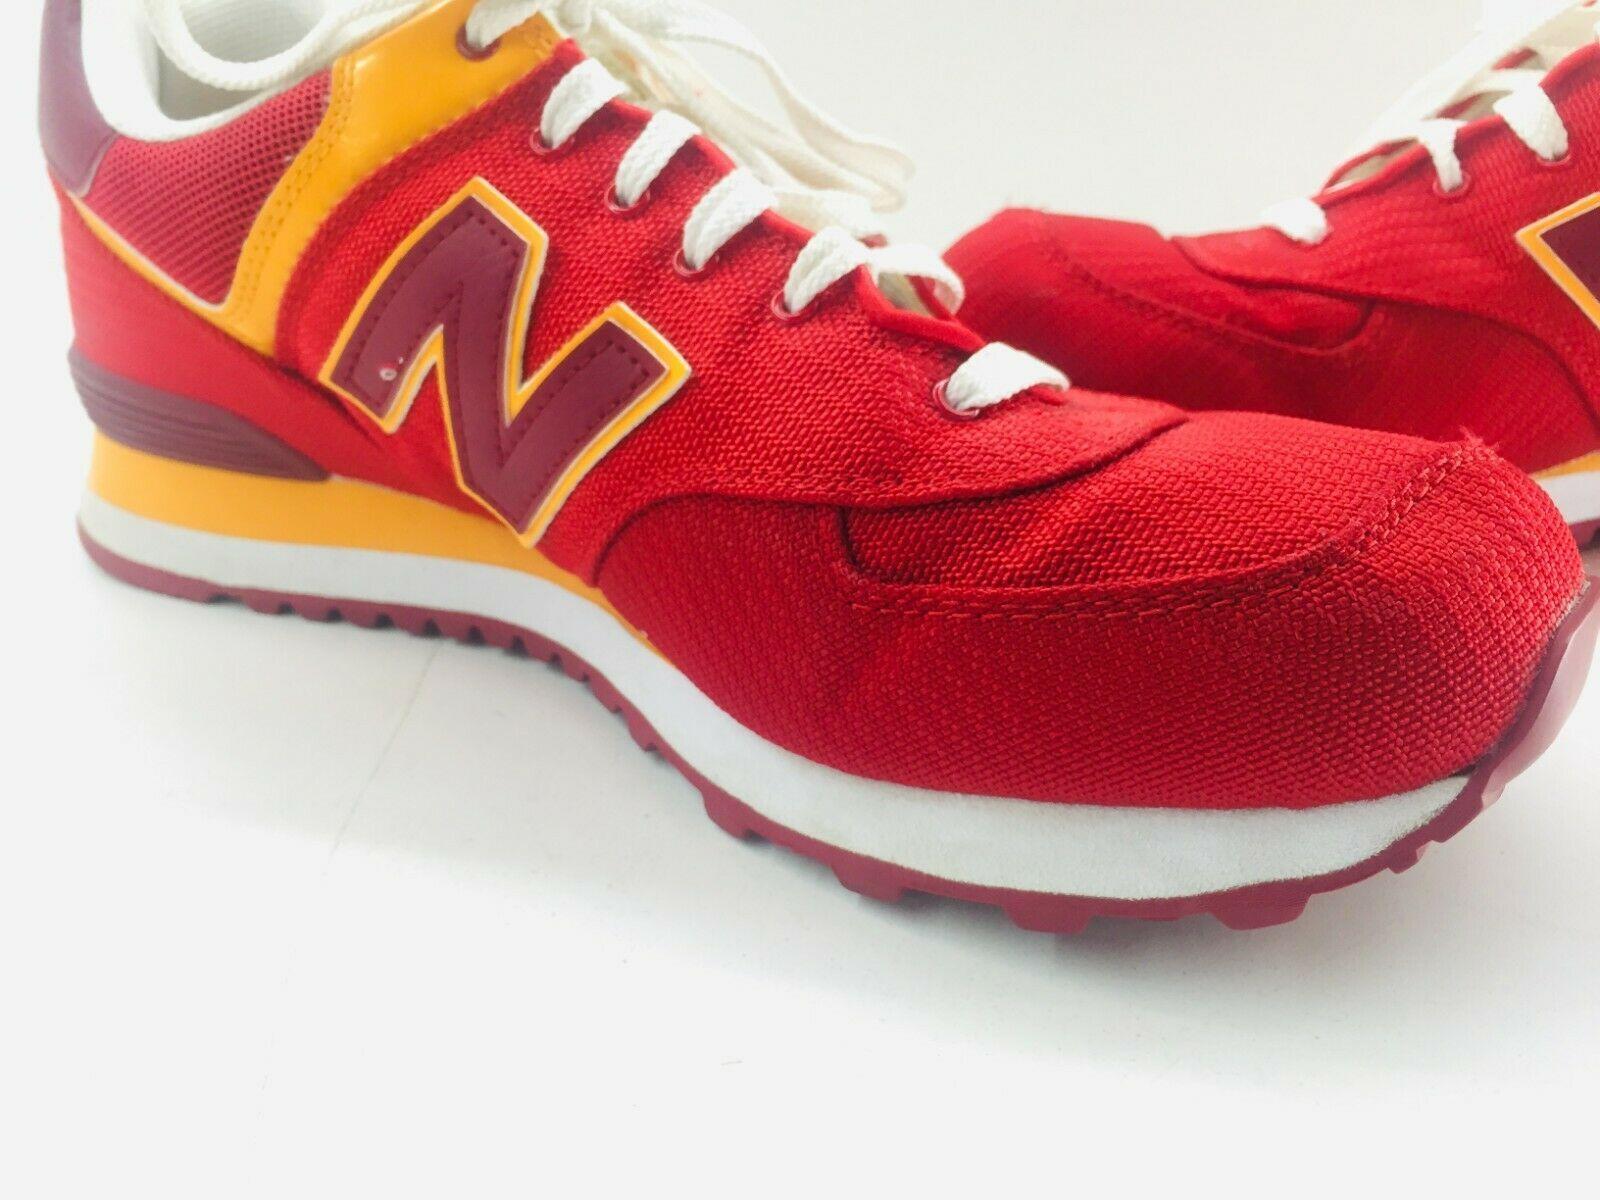 New Balance Athletic Sneaker Shoes Men's Sz 11.5 Red Orange ML574PPR  574 EUC image 3